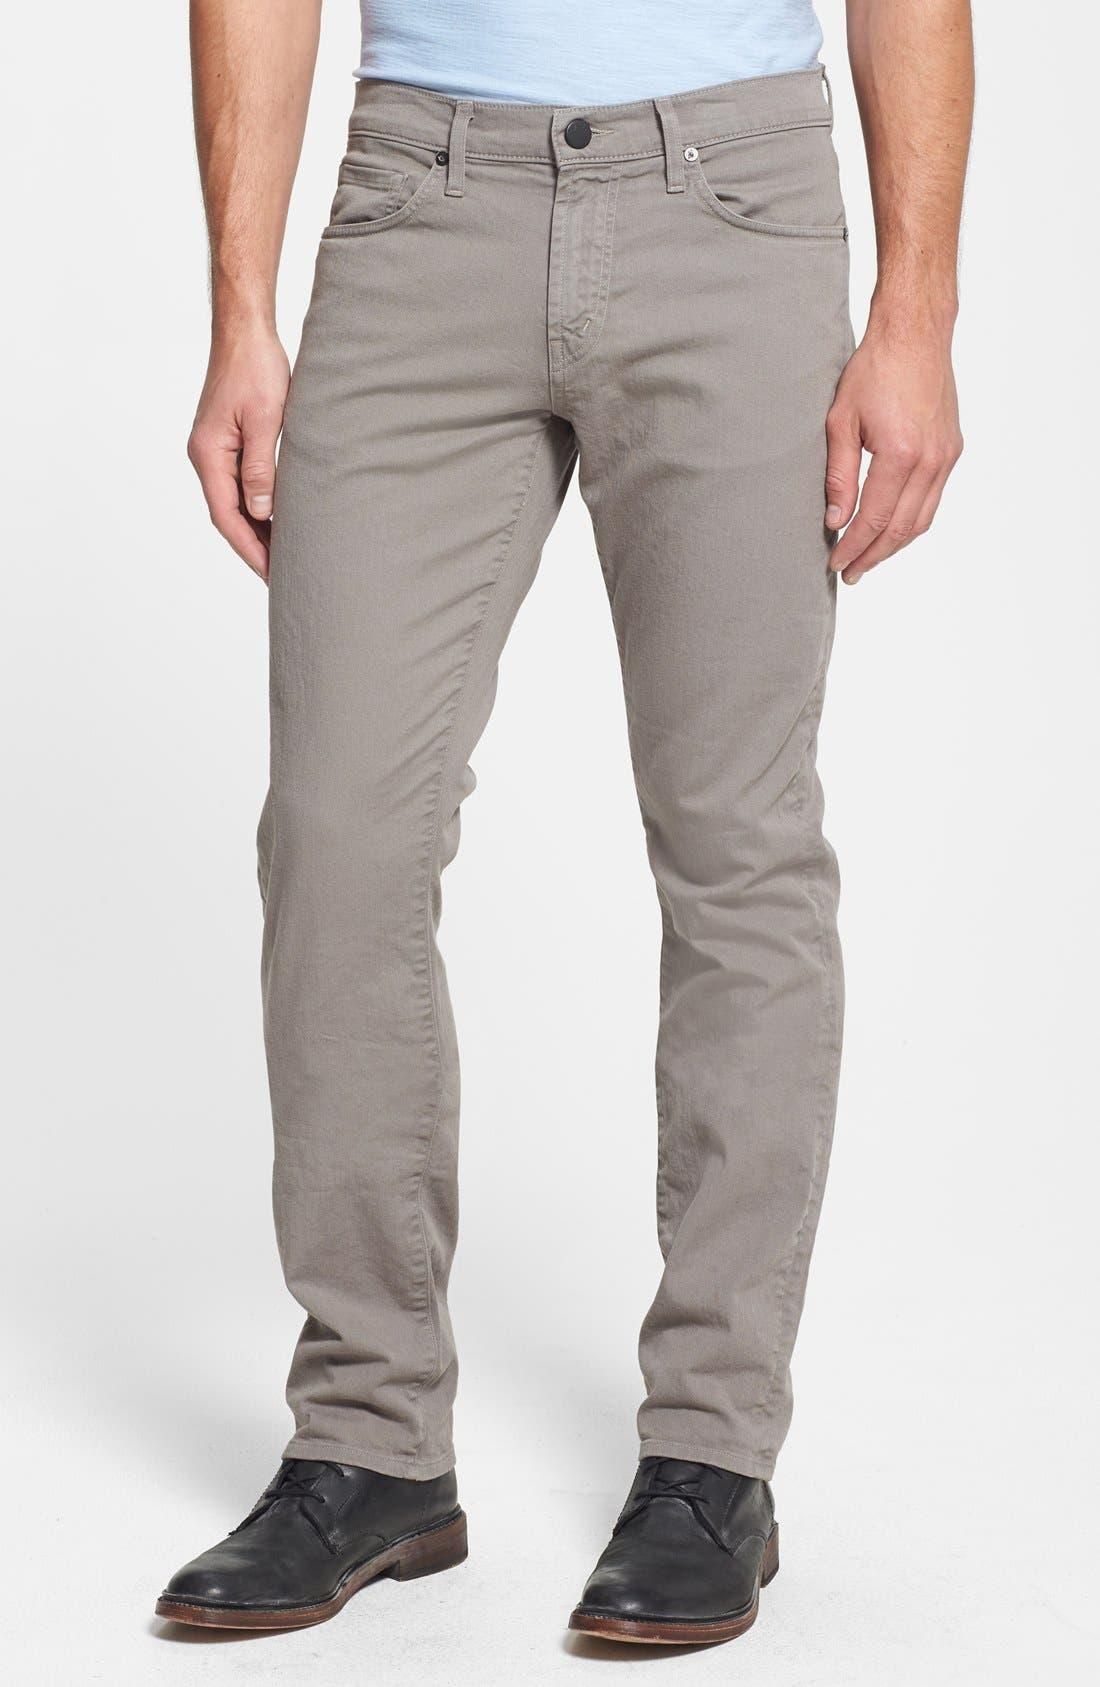 Alternate Image 1 Selected - J Brand 'Kane' Slim Straight Leg Jeans (Sergeant)